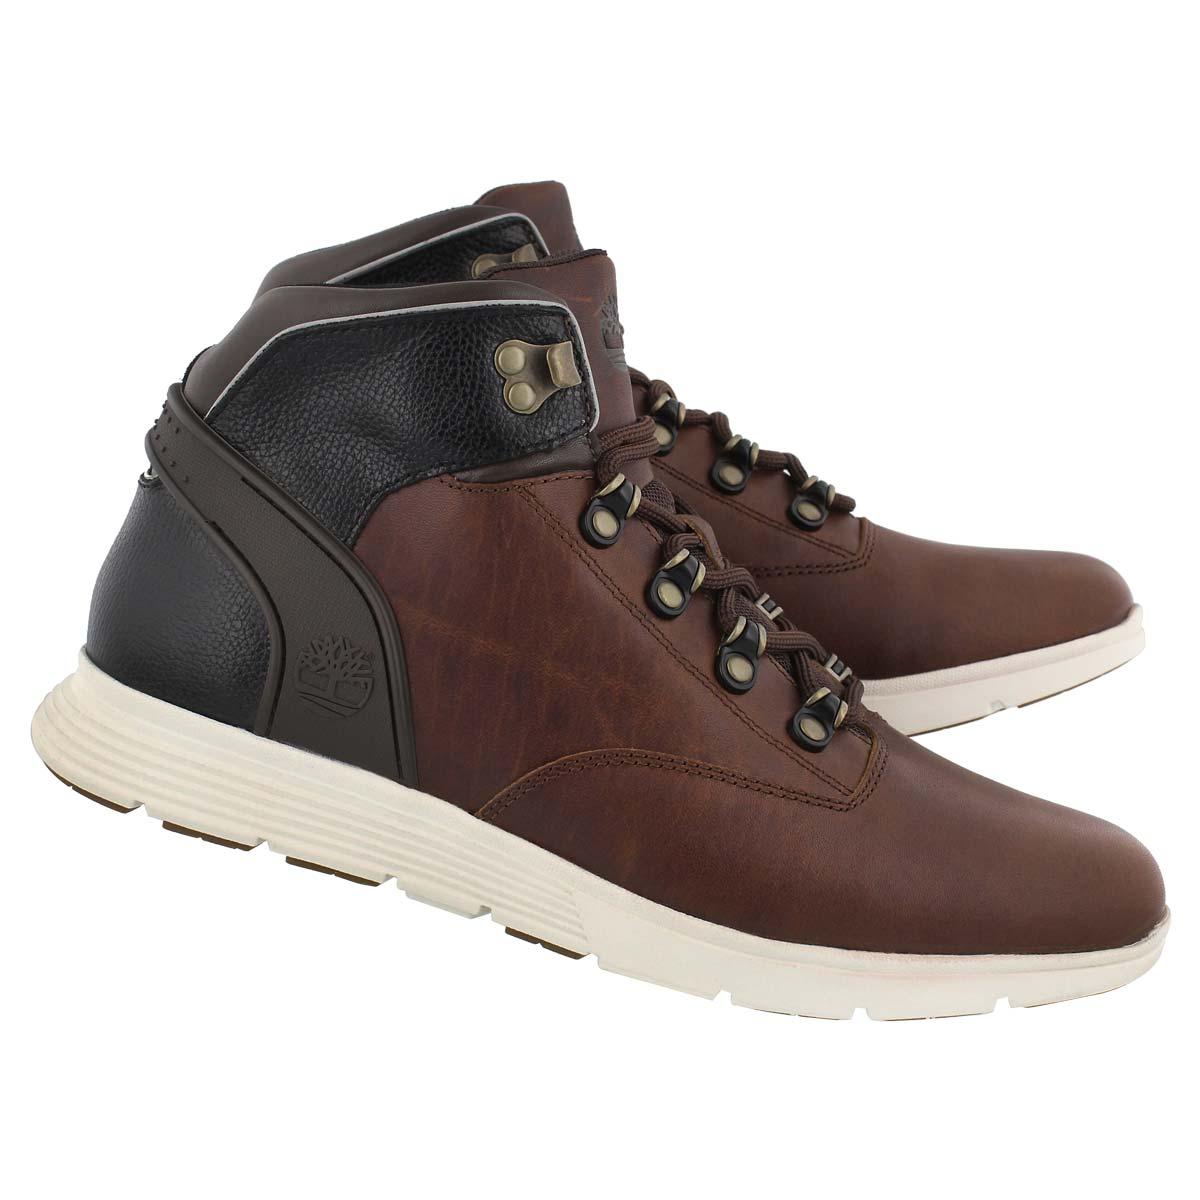 Mns Killington brown hiking ankle boot